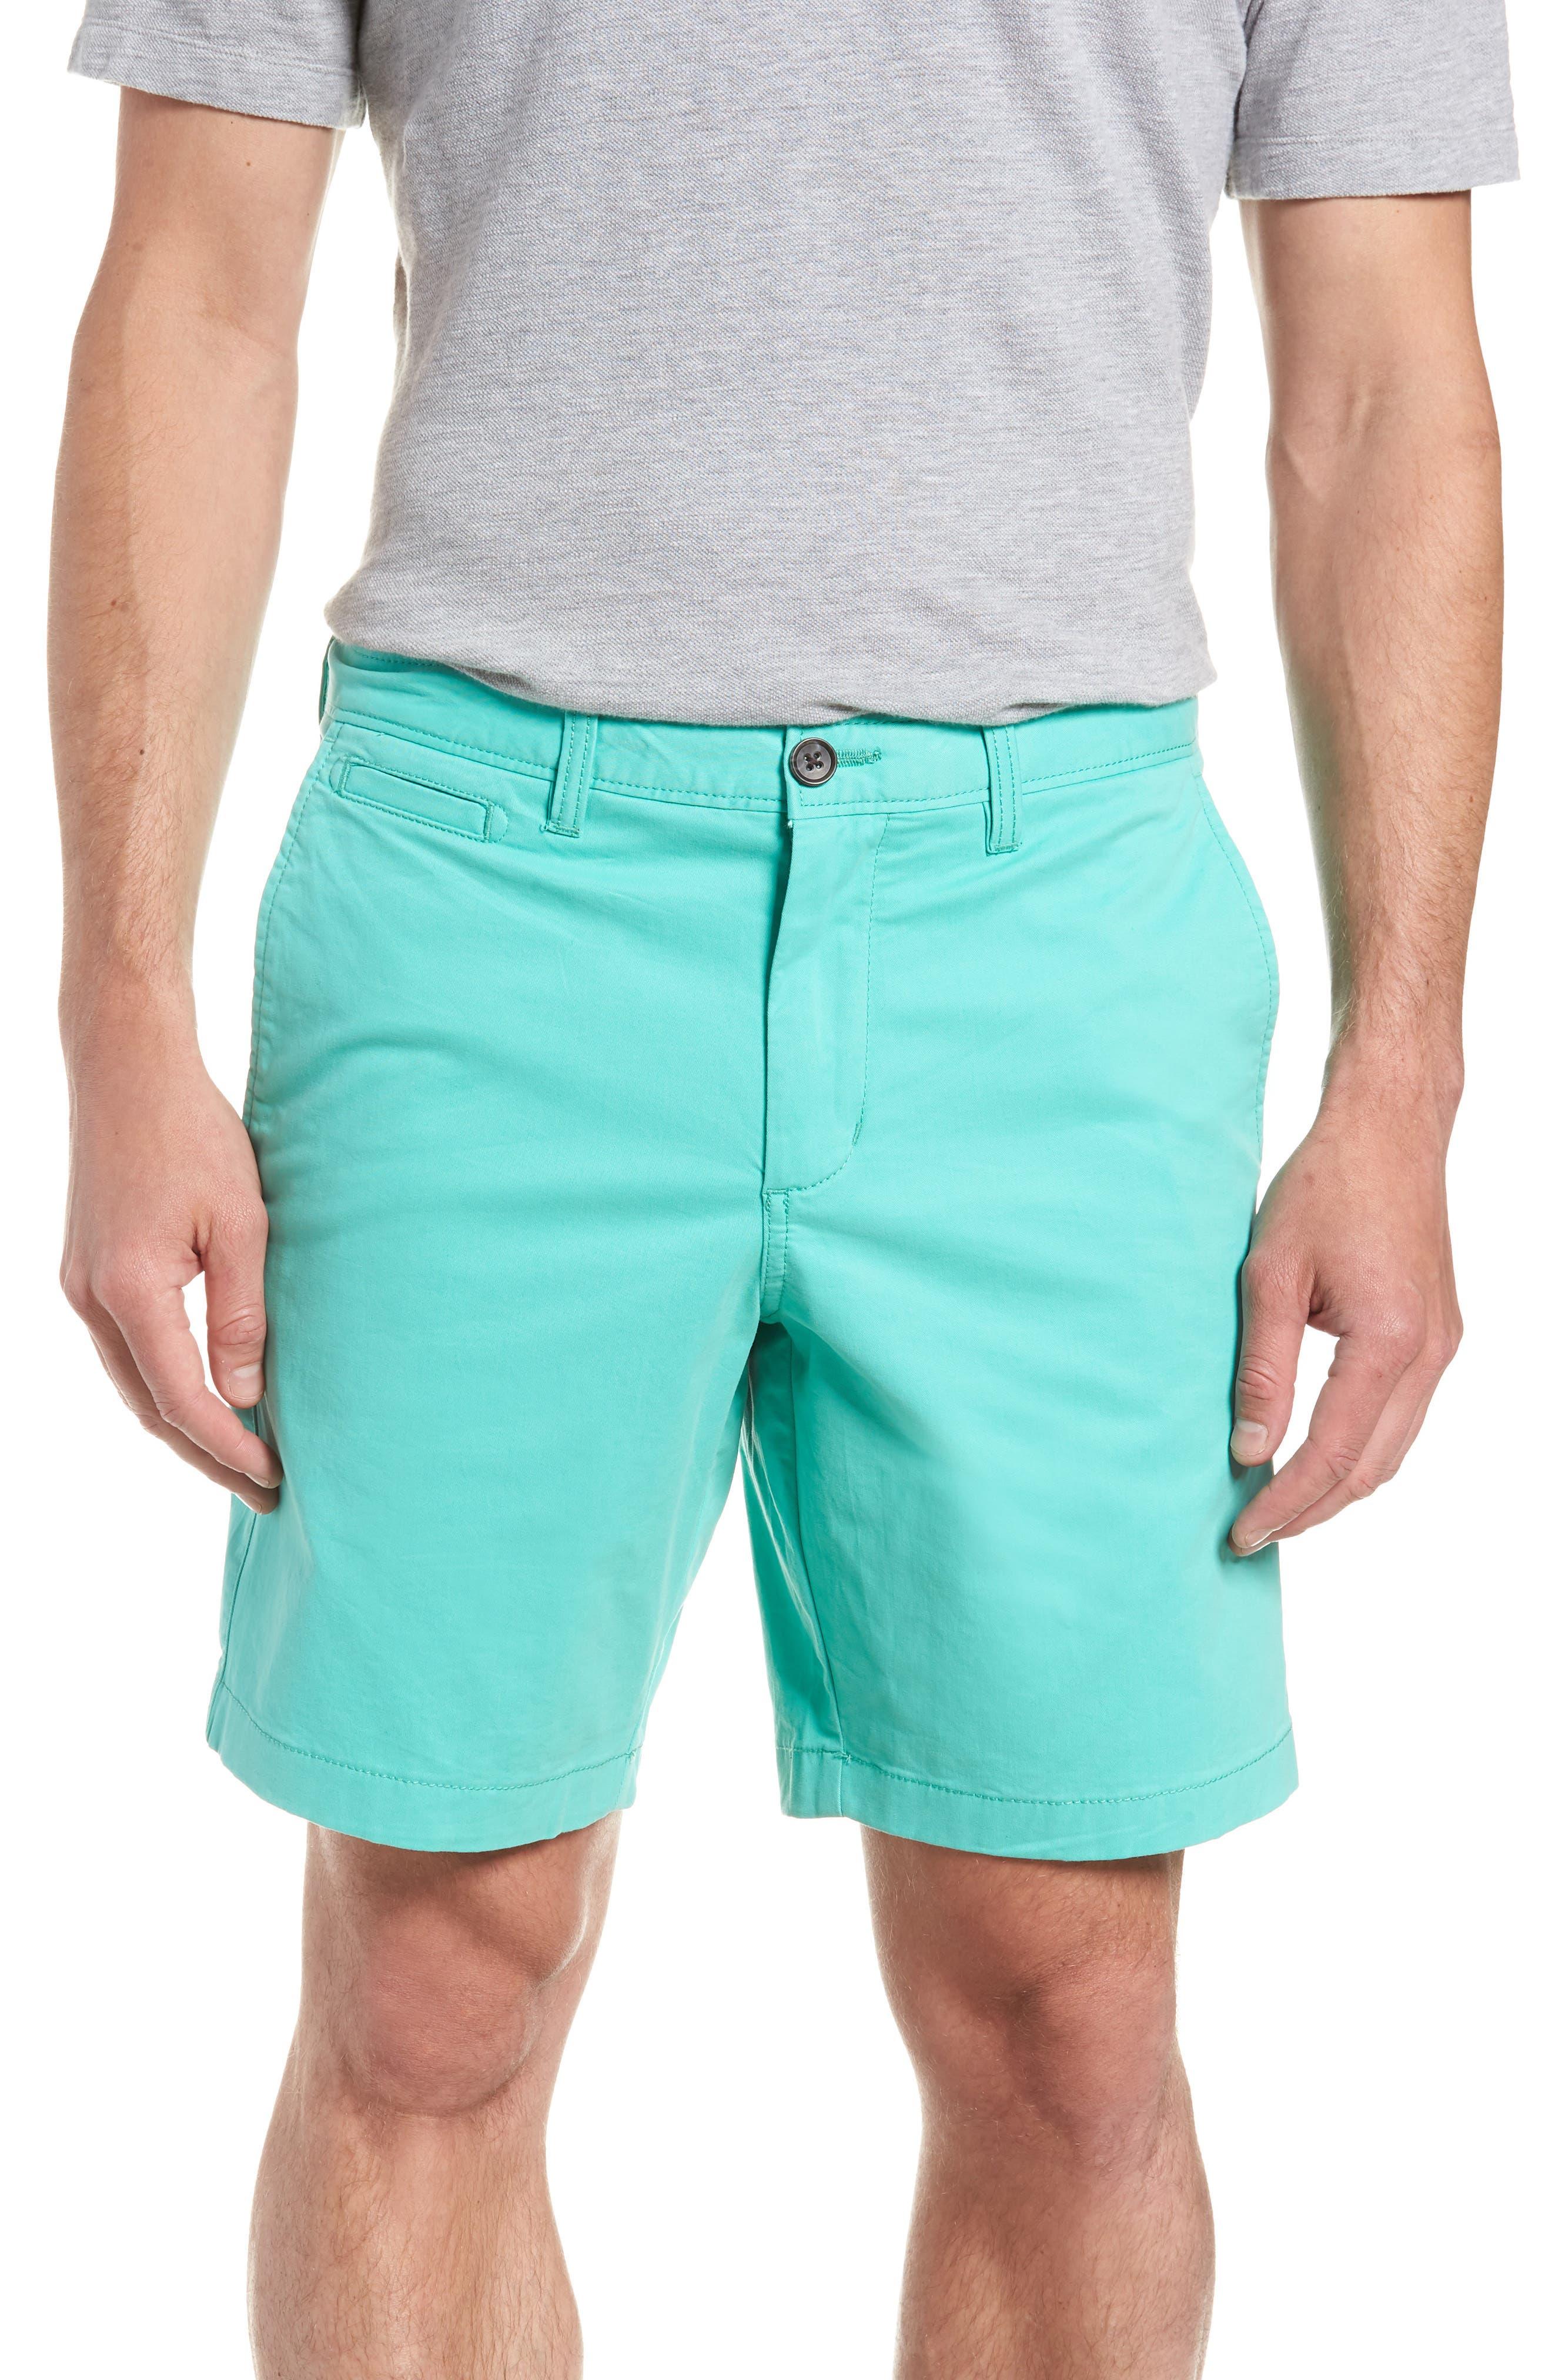 Ballard Slim Fit Stretch Chino 9-Inch Shorts,                             Main thumbnail 6, color,